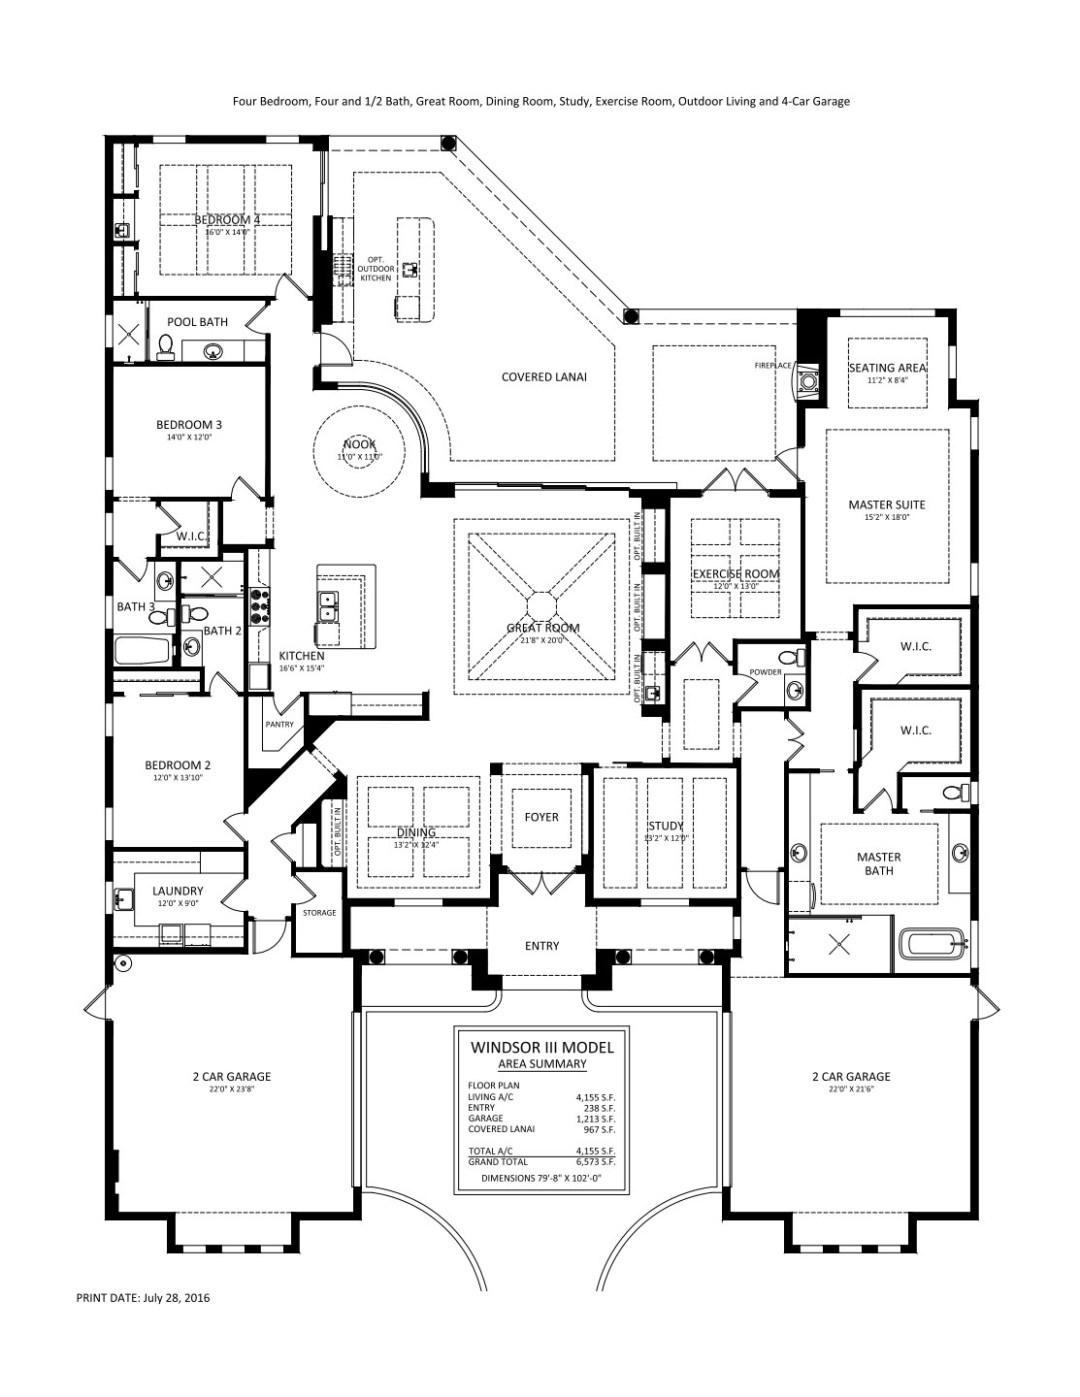 Stock Signature Homes Twin Eagles Windsor III Floor Plan